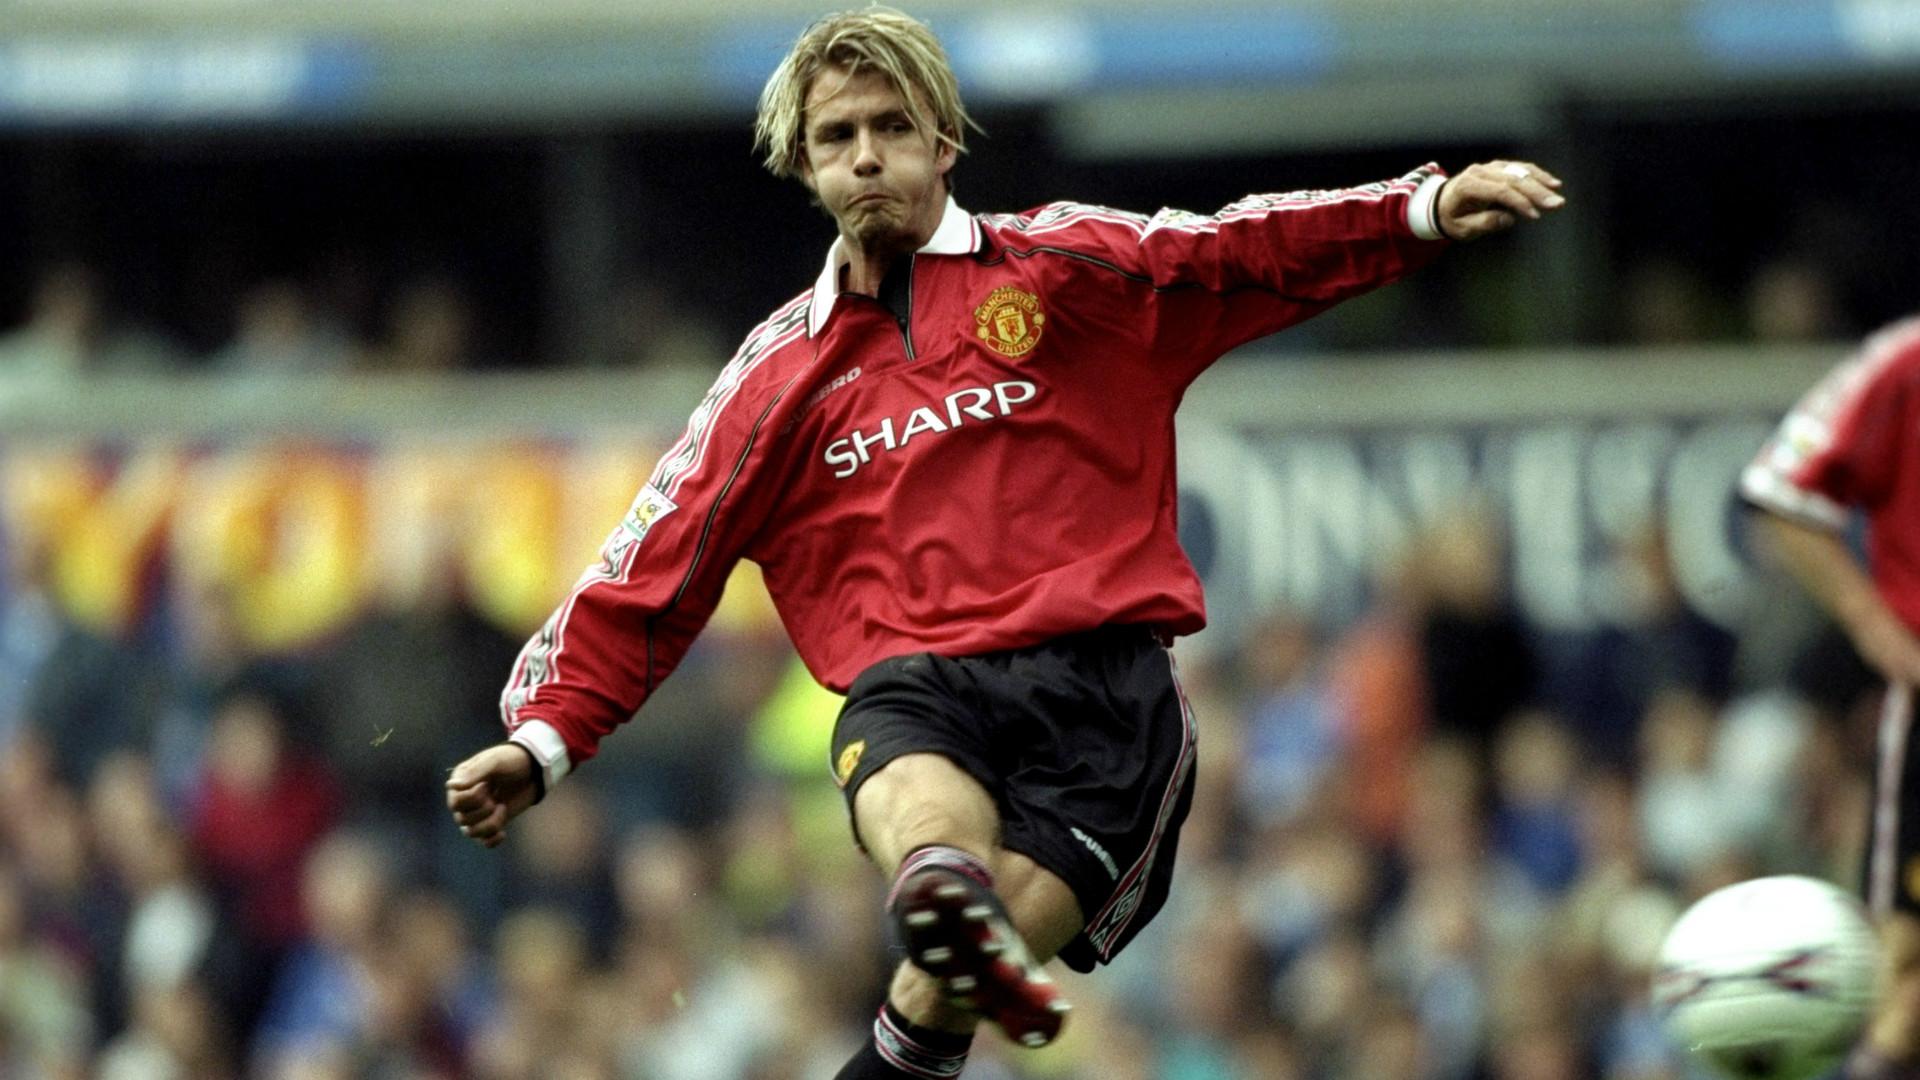 David Beckham Manchester United 1999-2000